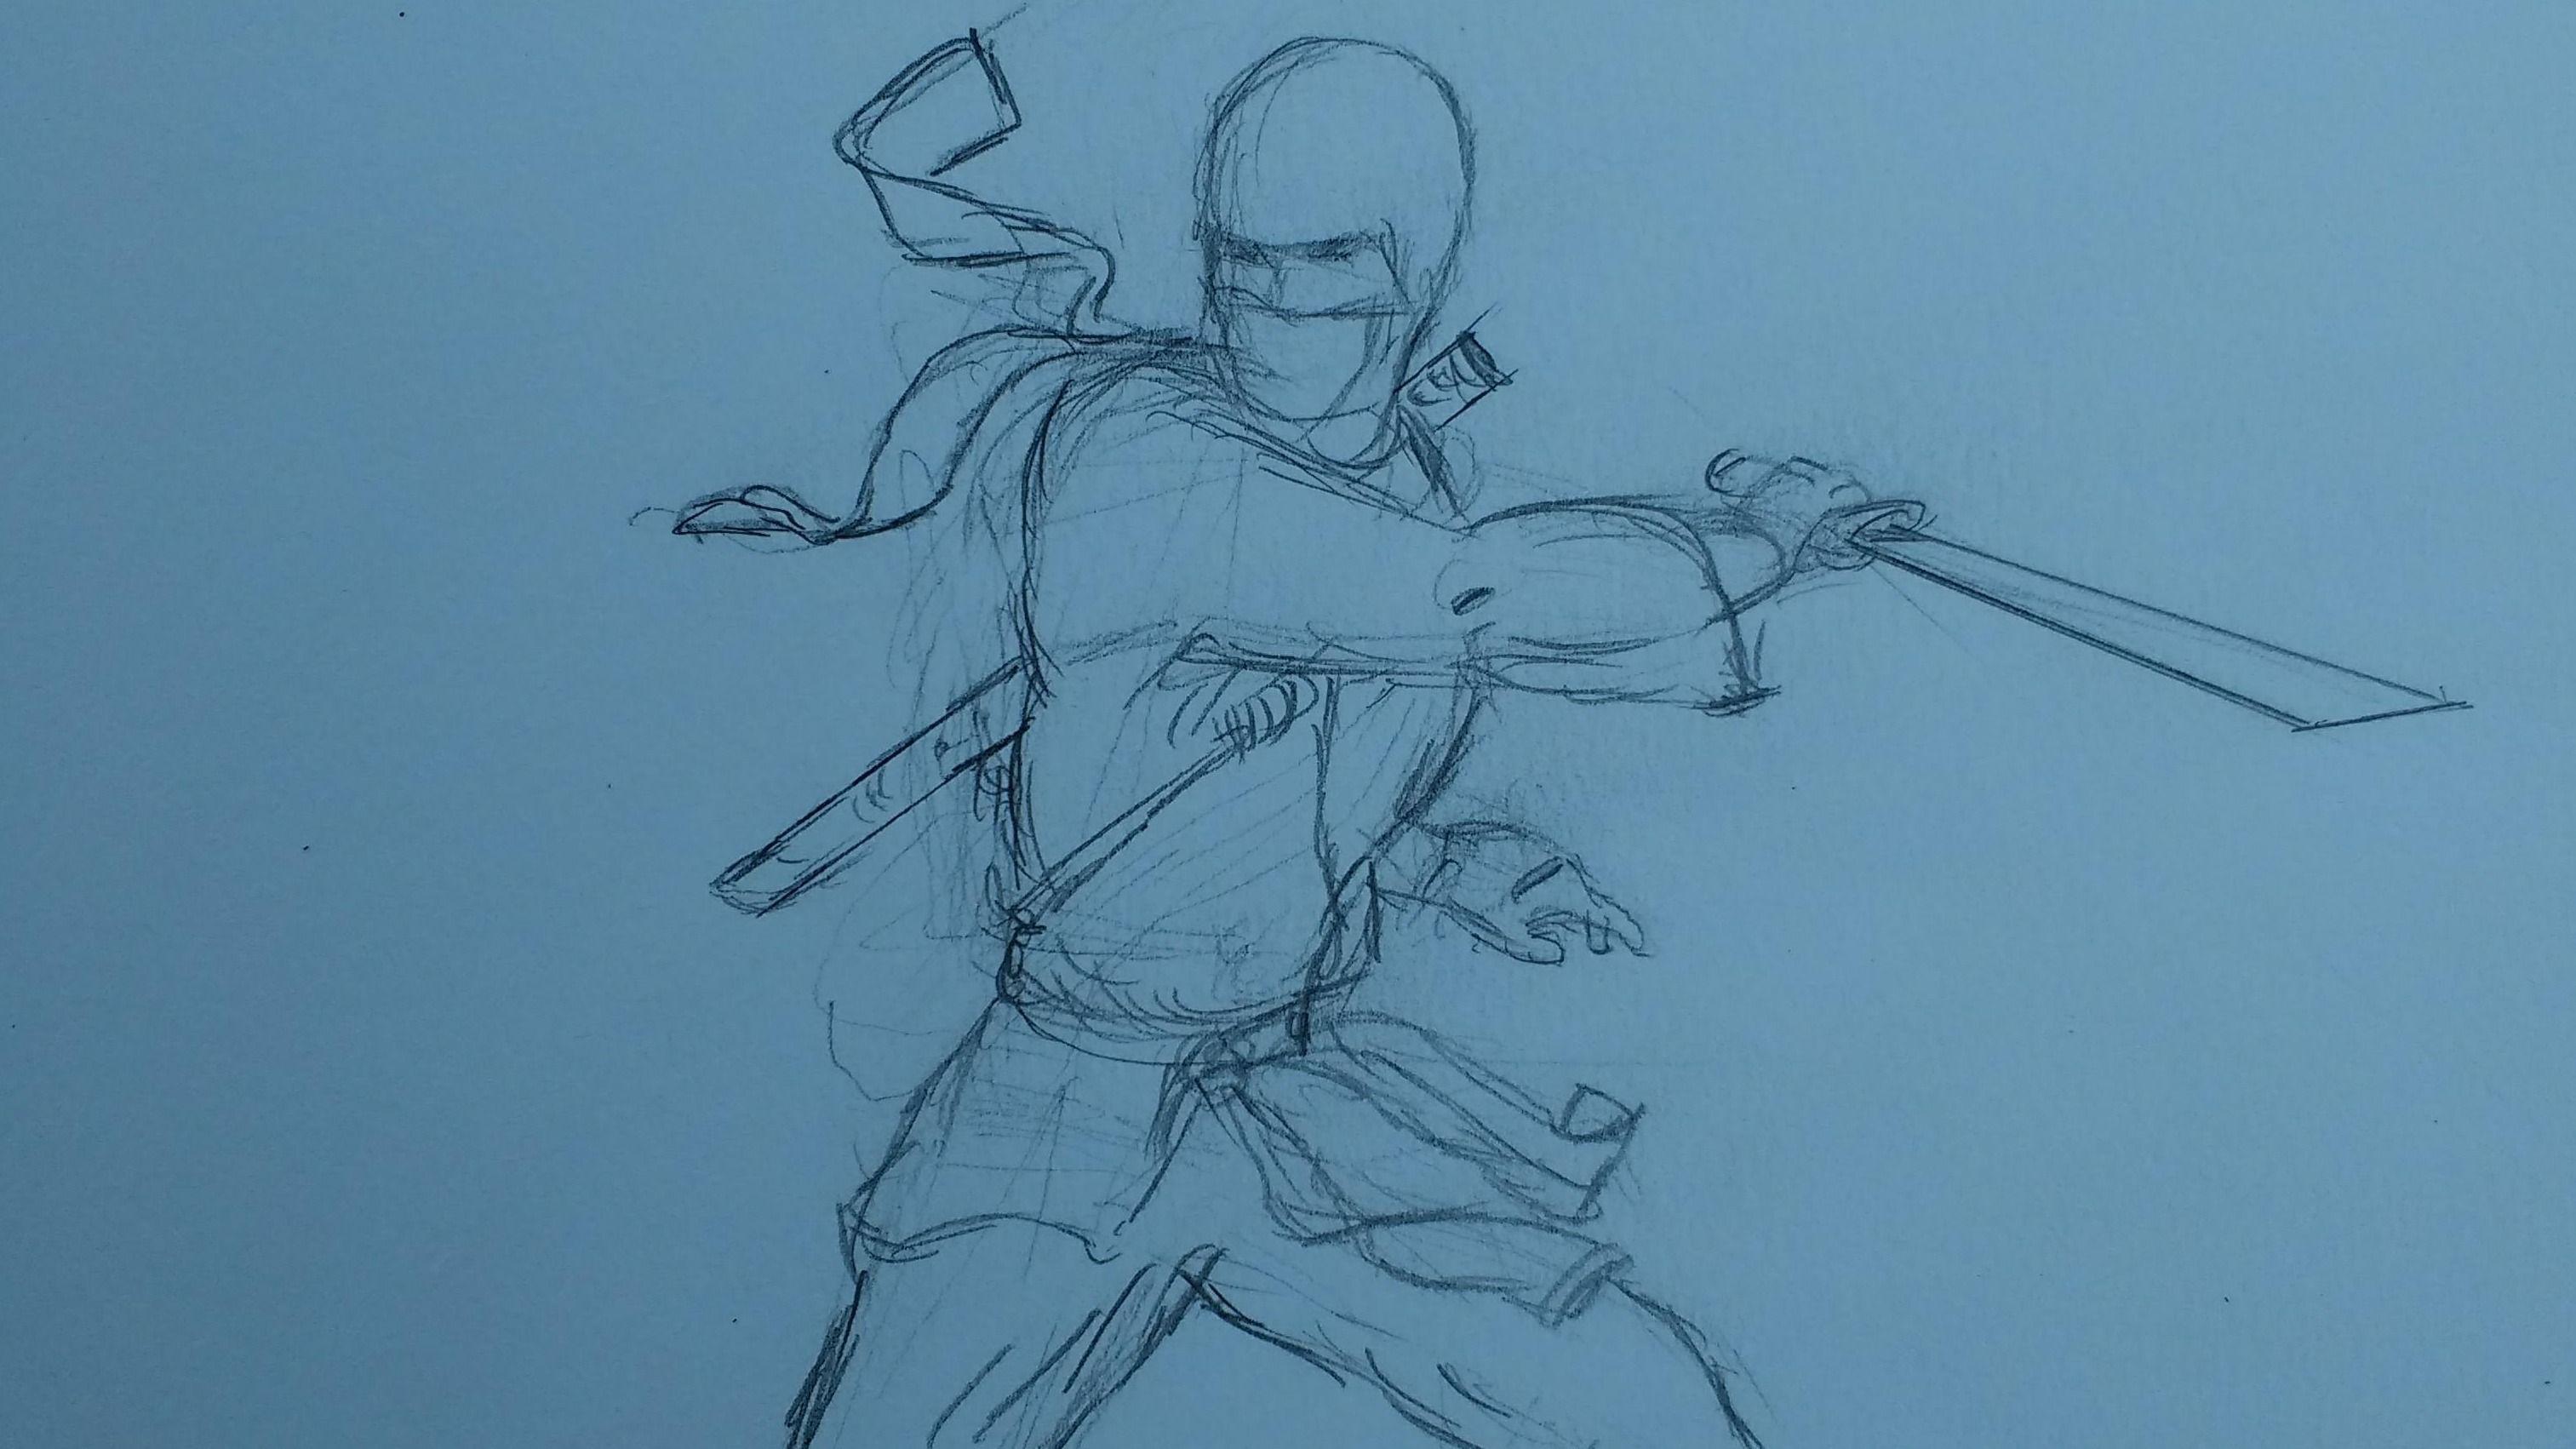 Warrior Spirit Fitness and Self-Defense (Fairfax, VA Group)